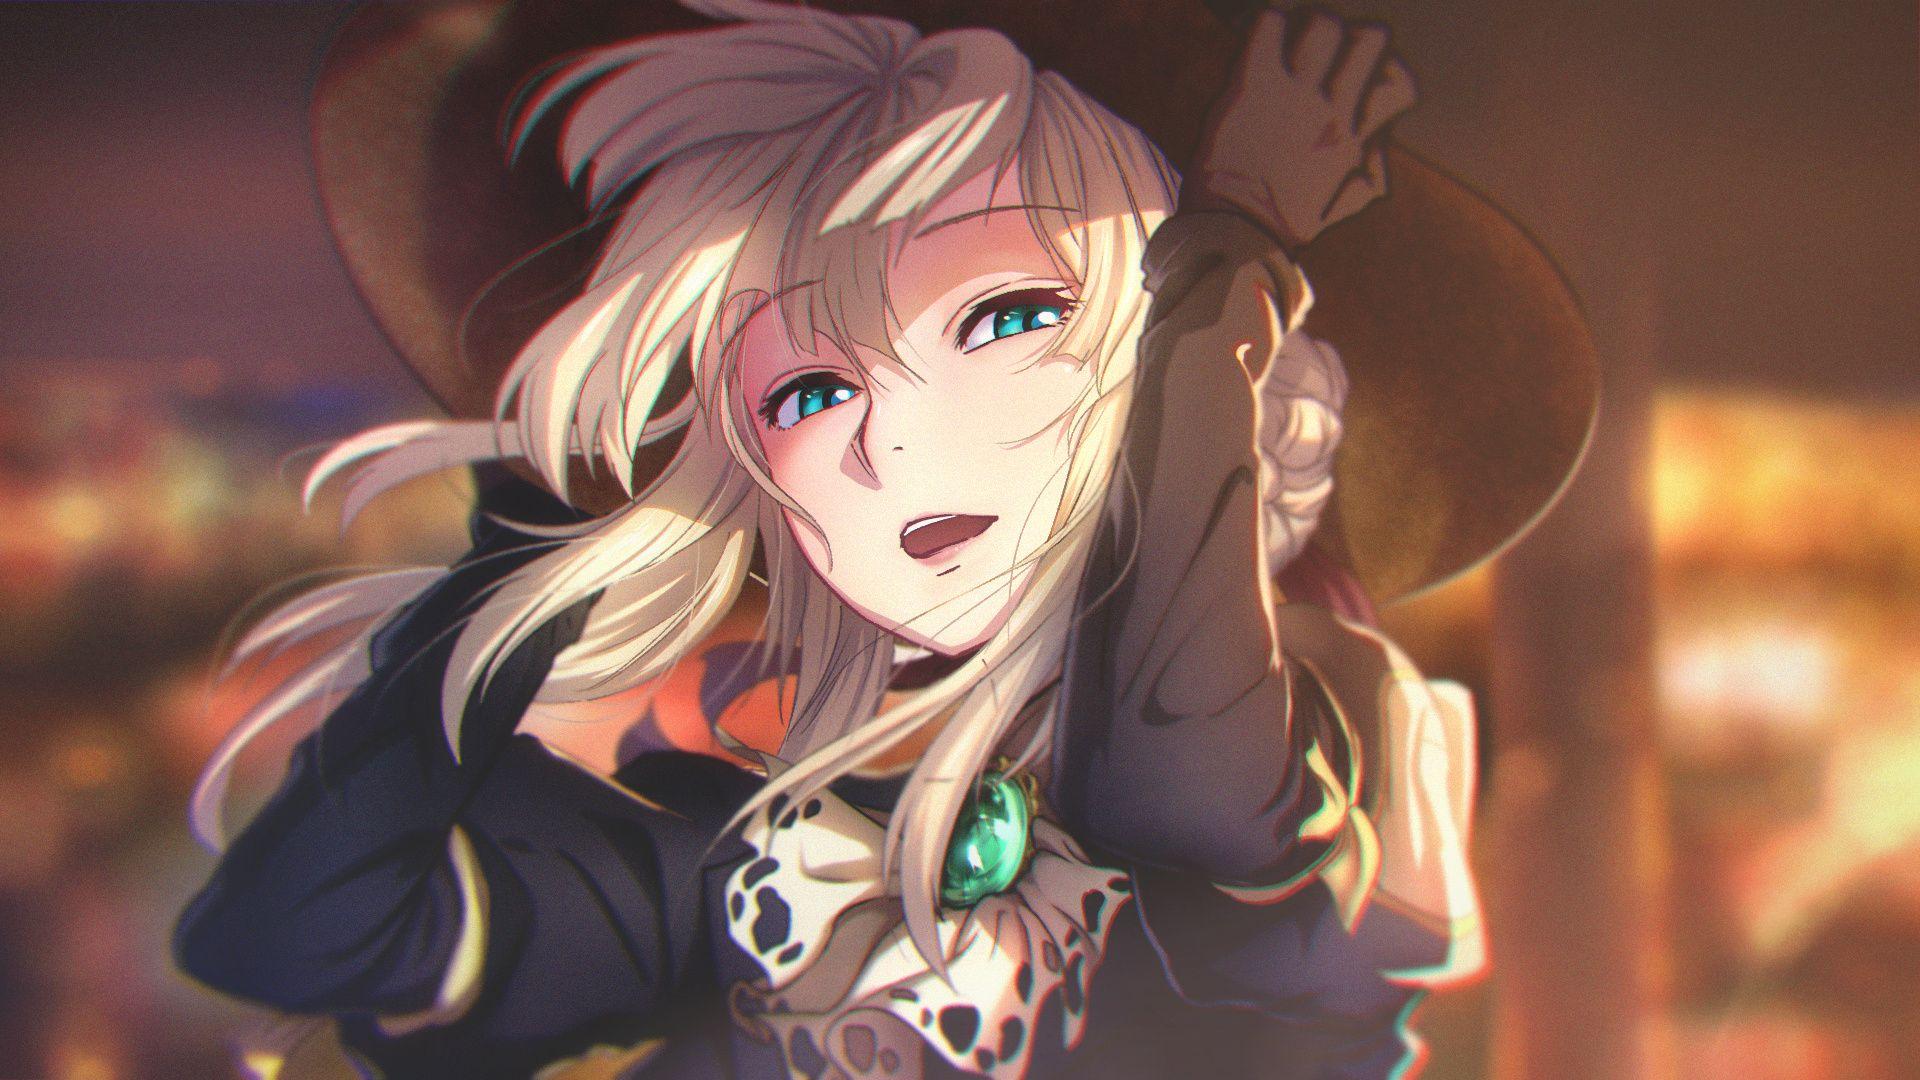 Violet Evergarden 캐릭터 아트, 그림, 일본만화